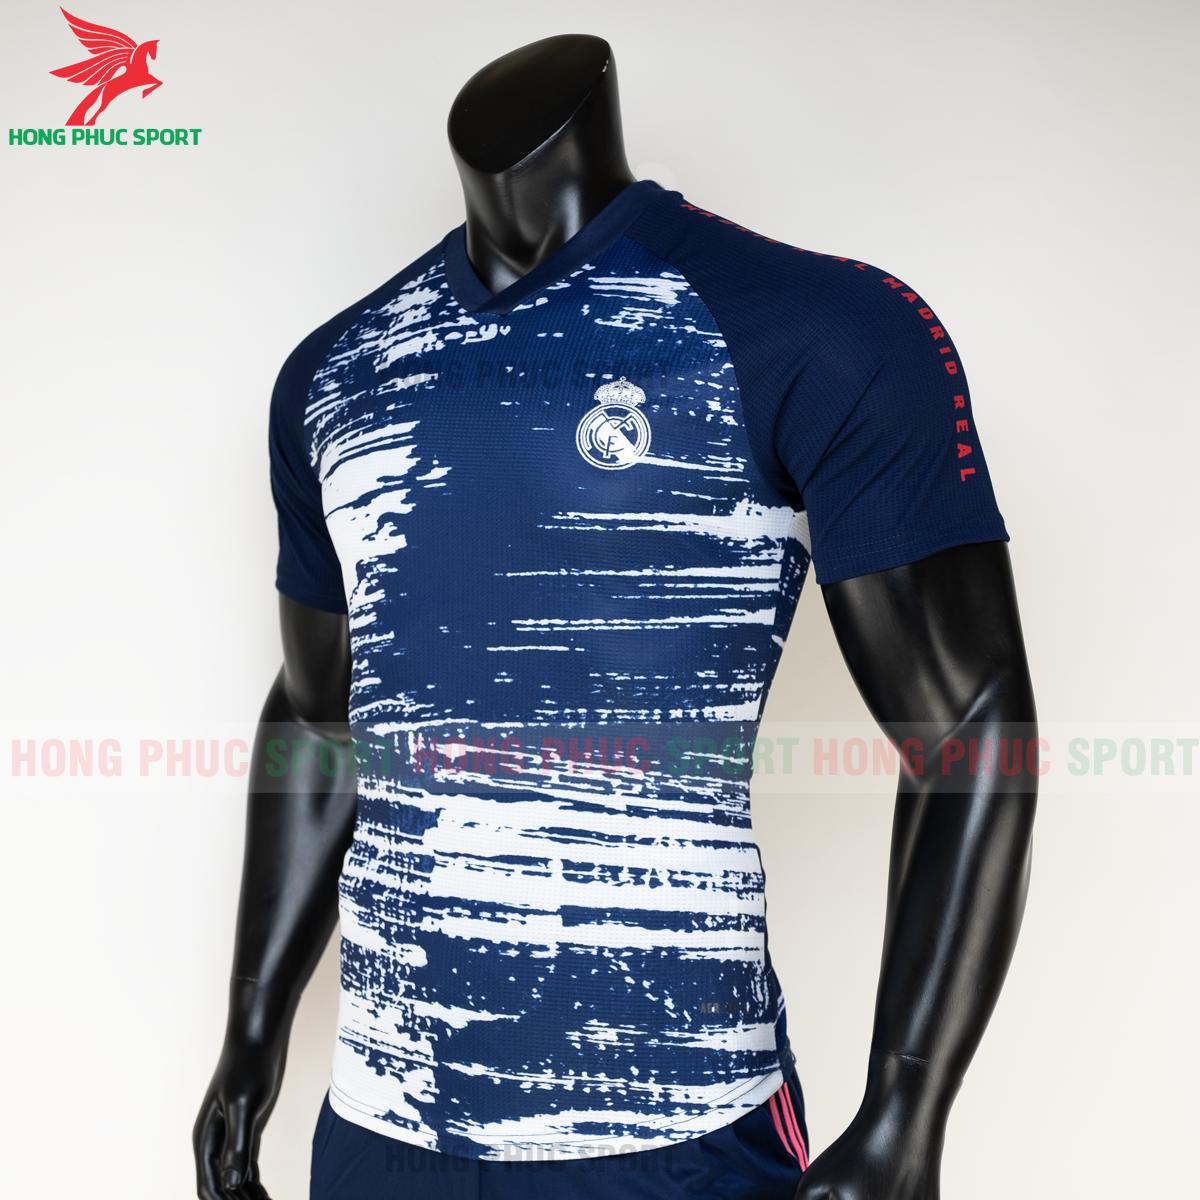 https://cdn.hongphucsport.com/unsafe/s4.shopbay.vn/files/285/ao-bong-da-real-madrid-20-21-pre-match-hang-thailand-3-5faf55e527f08.png